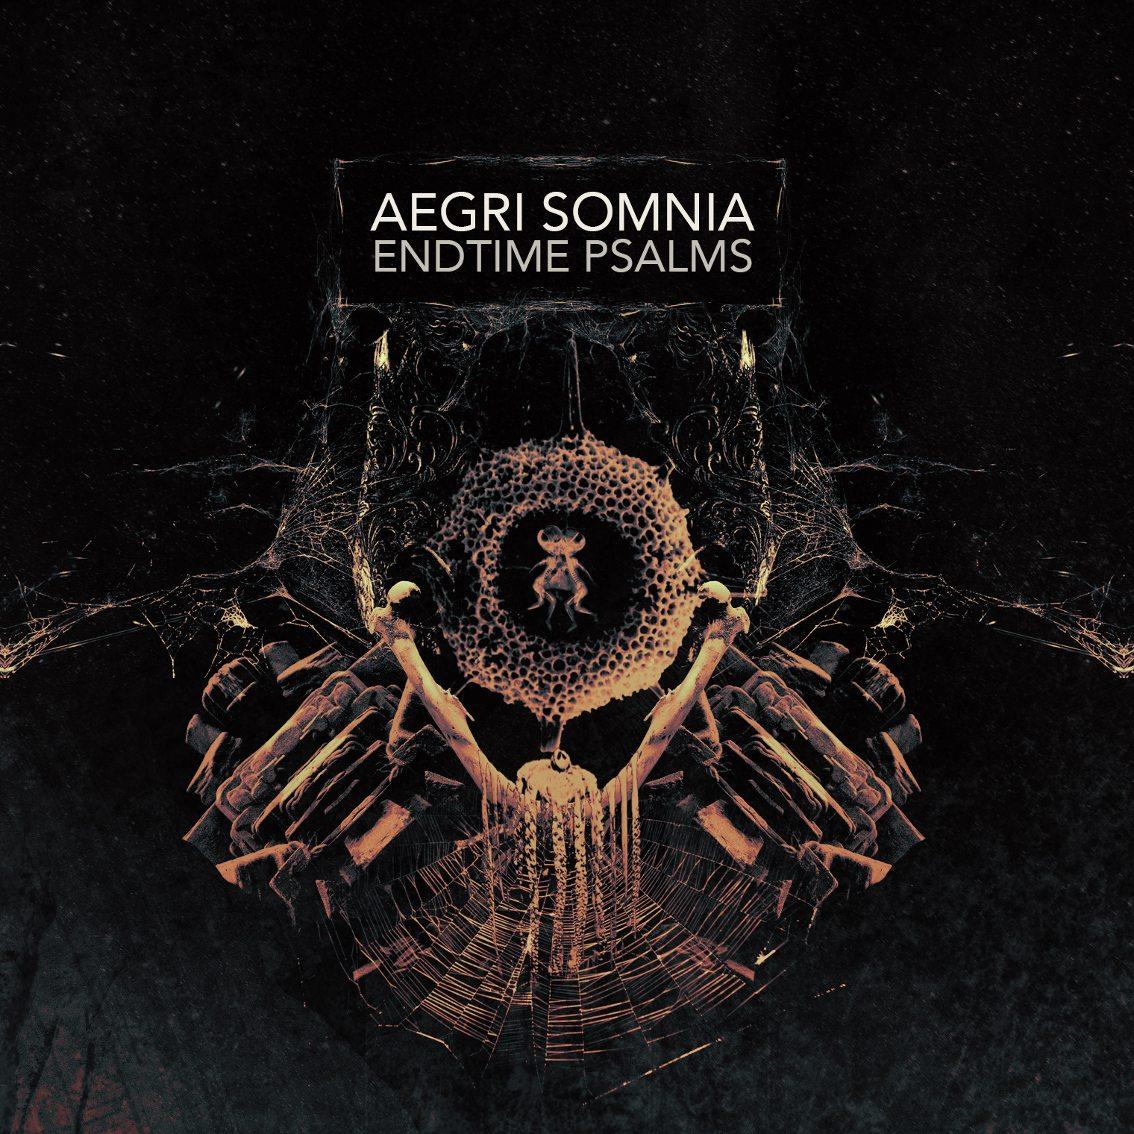 2nd album Aegri Somnia ('Endtime Psalms') released on Cryo Chamber